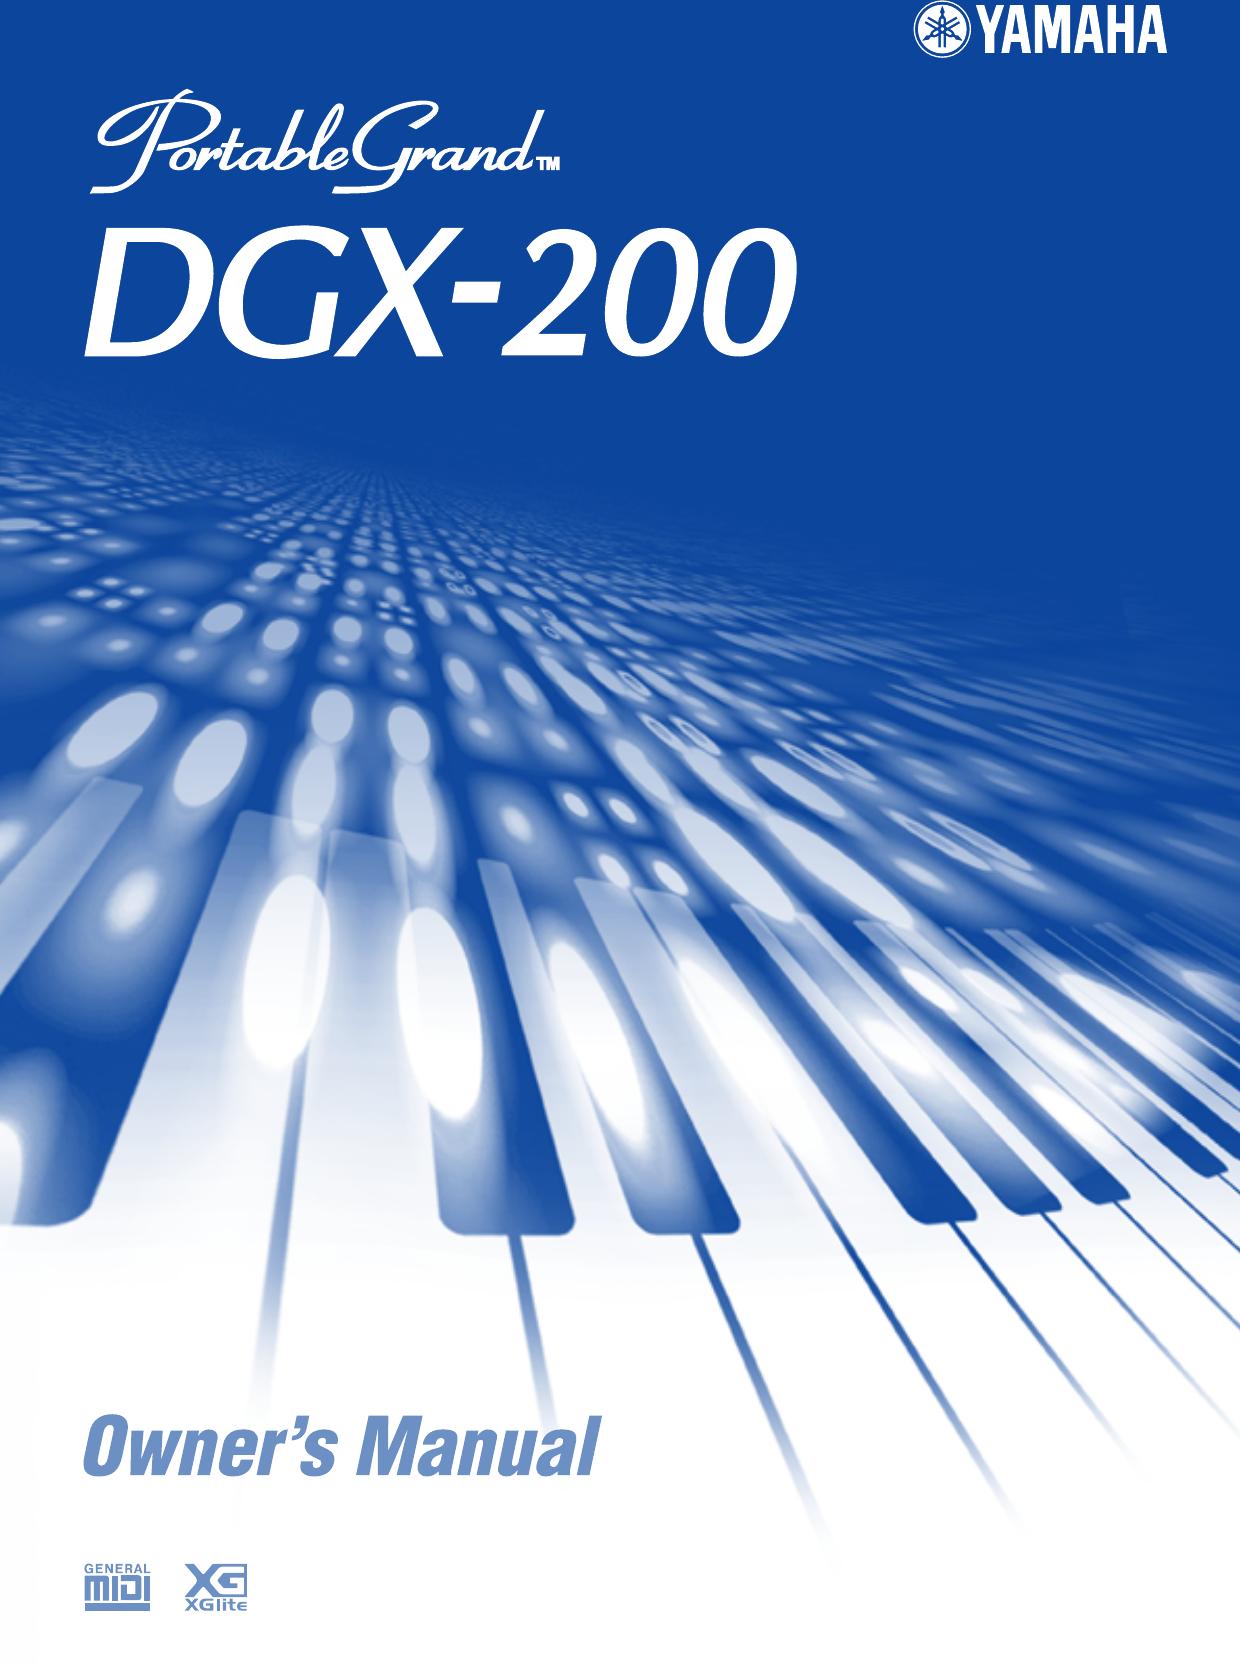 T-Power Ac//DC Adapter 12V Charger for Yamaha Digital Piano Midi Keyboard DD-9 DGX-200 DGX-202 DGX-203 DGX-205 DGX-220 DGX-230 DGX-300 DGX-305 DGX-500 DGX-505 DGX-520 DGX-530 DGX-620 DGX-630 DGX-630B